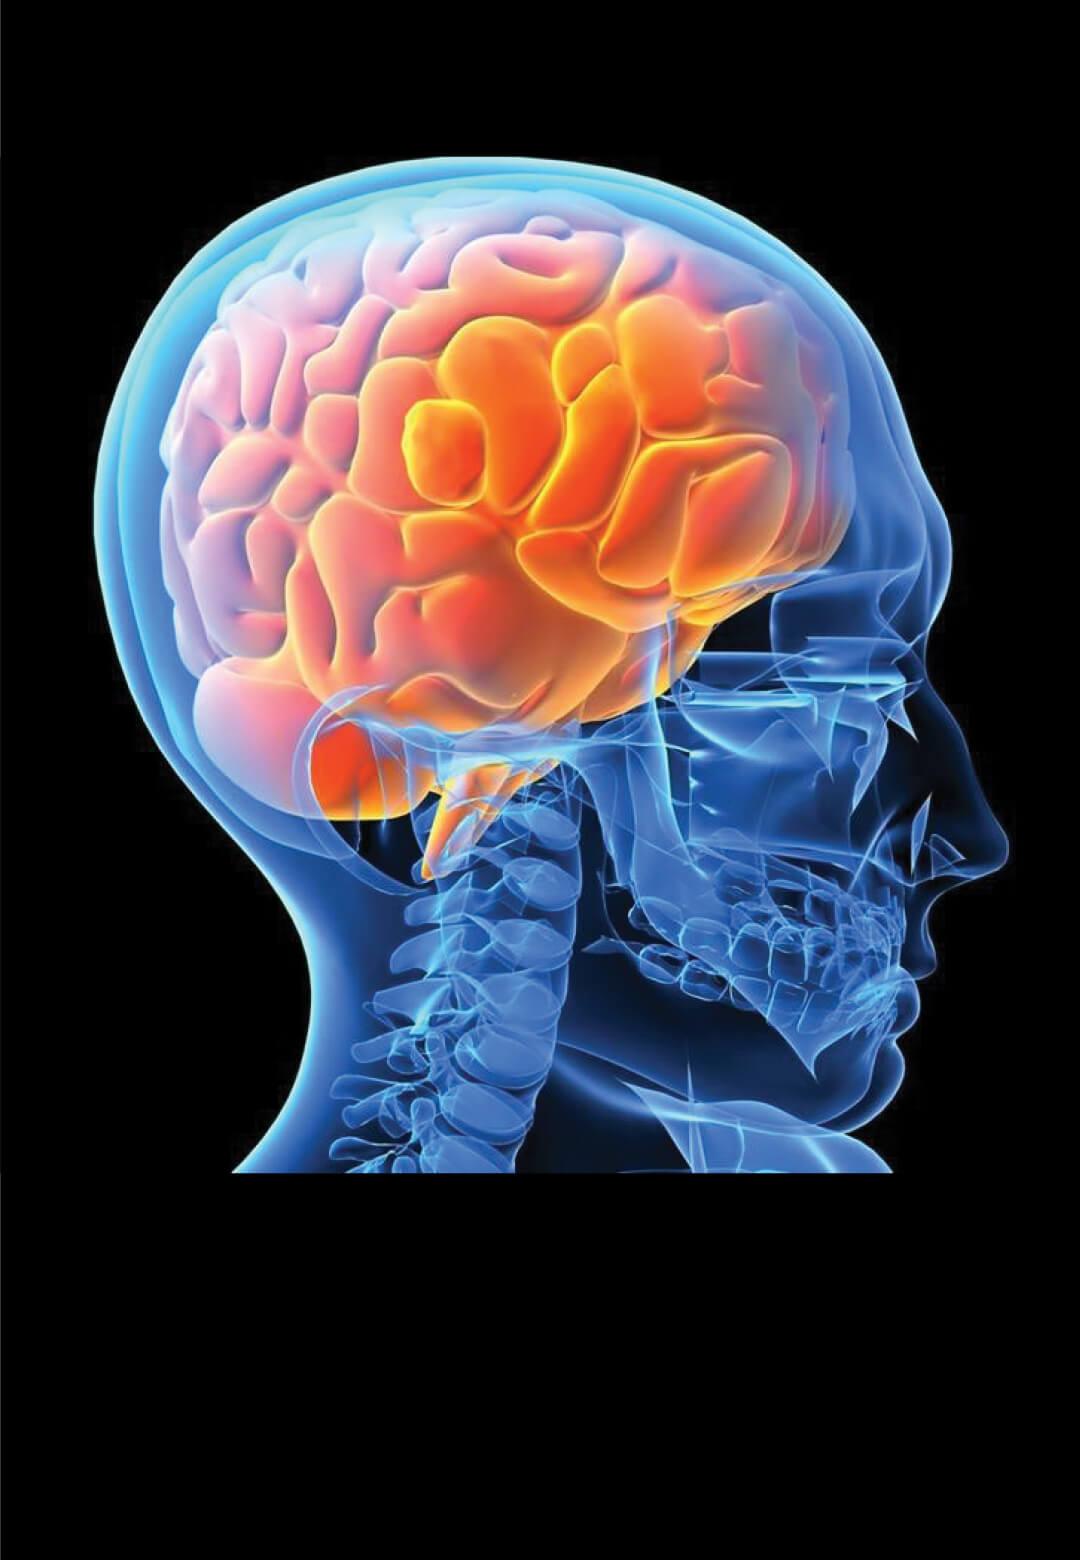 Image of a human brain   Digital Legacies: Self-determination   Julius Wiedemann   STIRworld